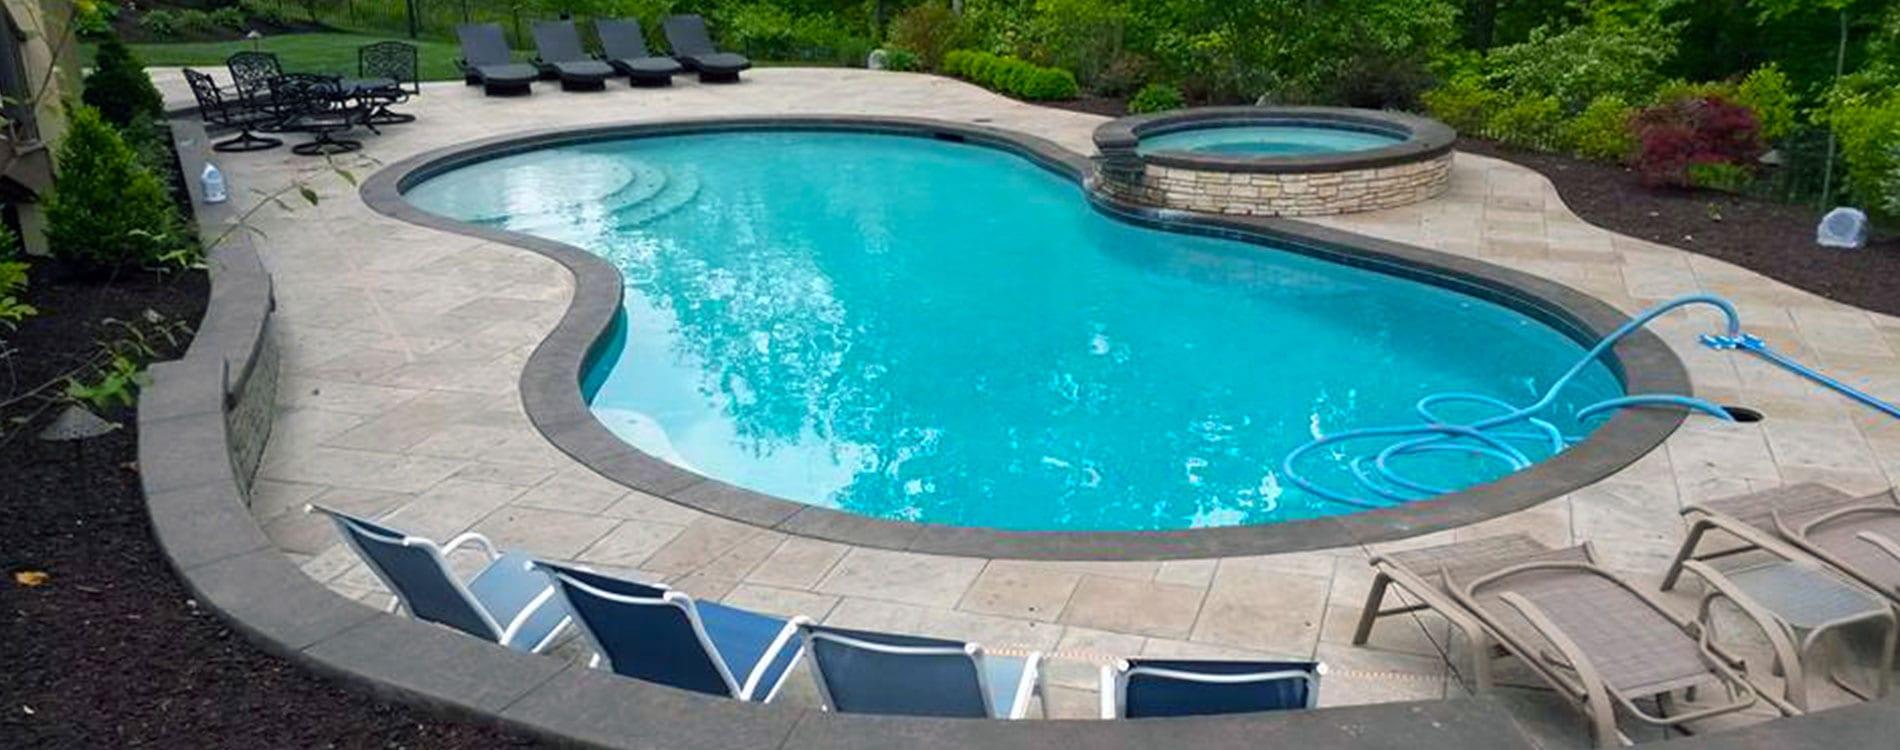 Indiana Custom Pool Builder